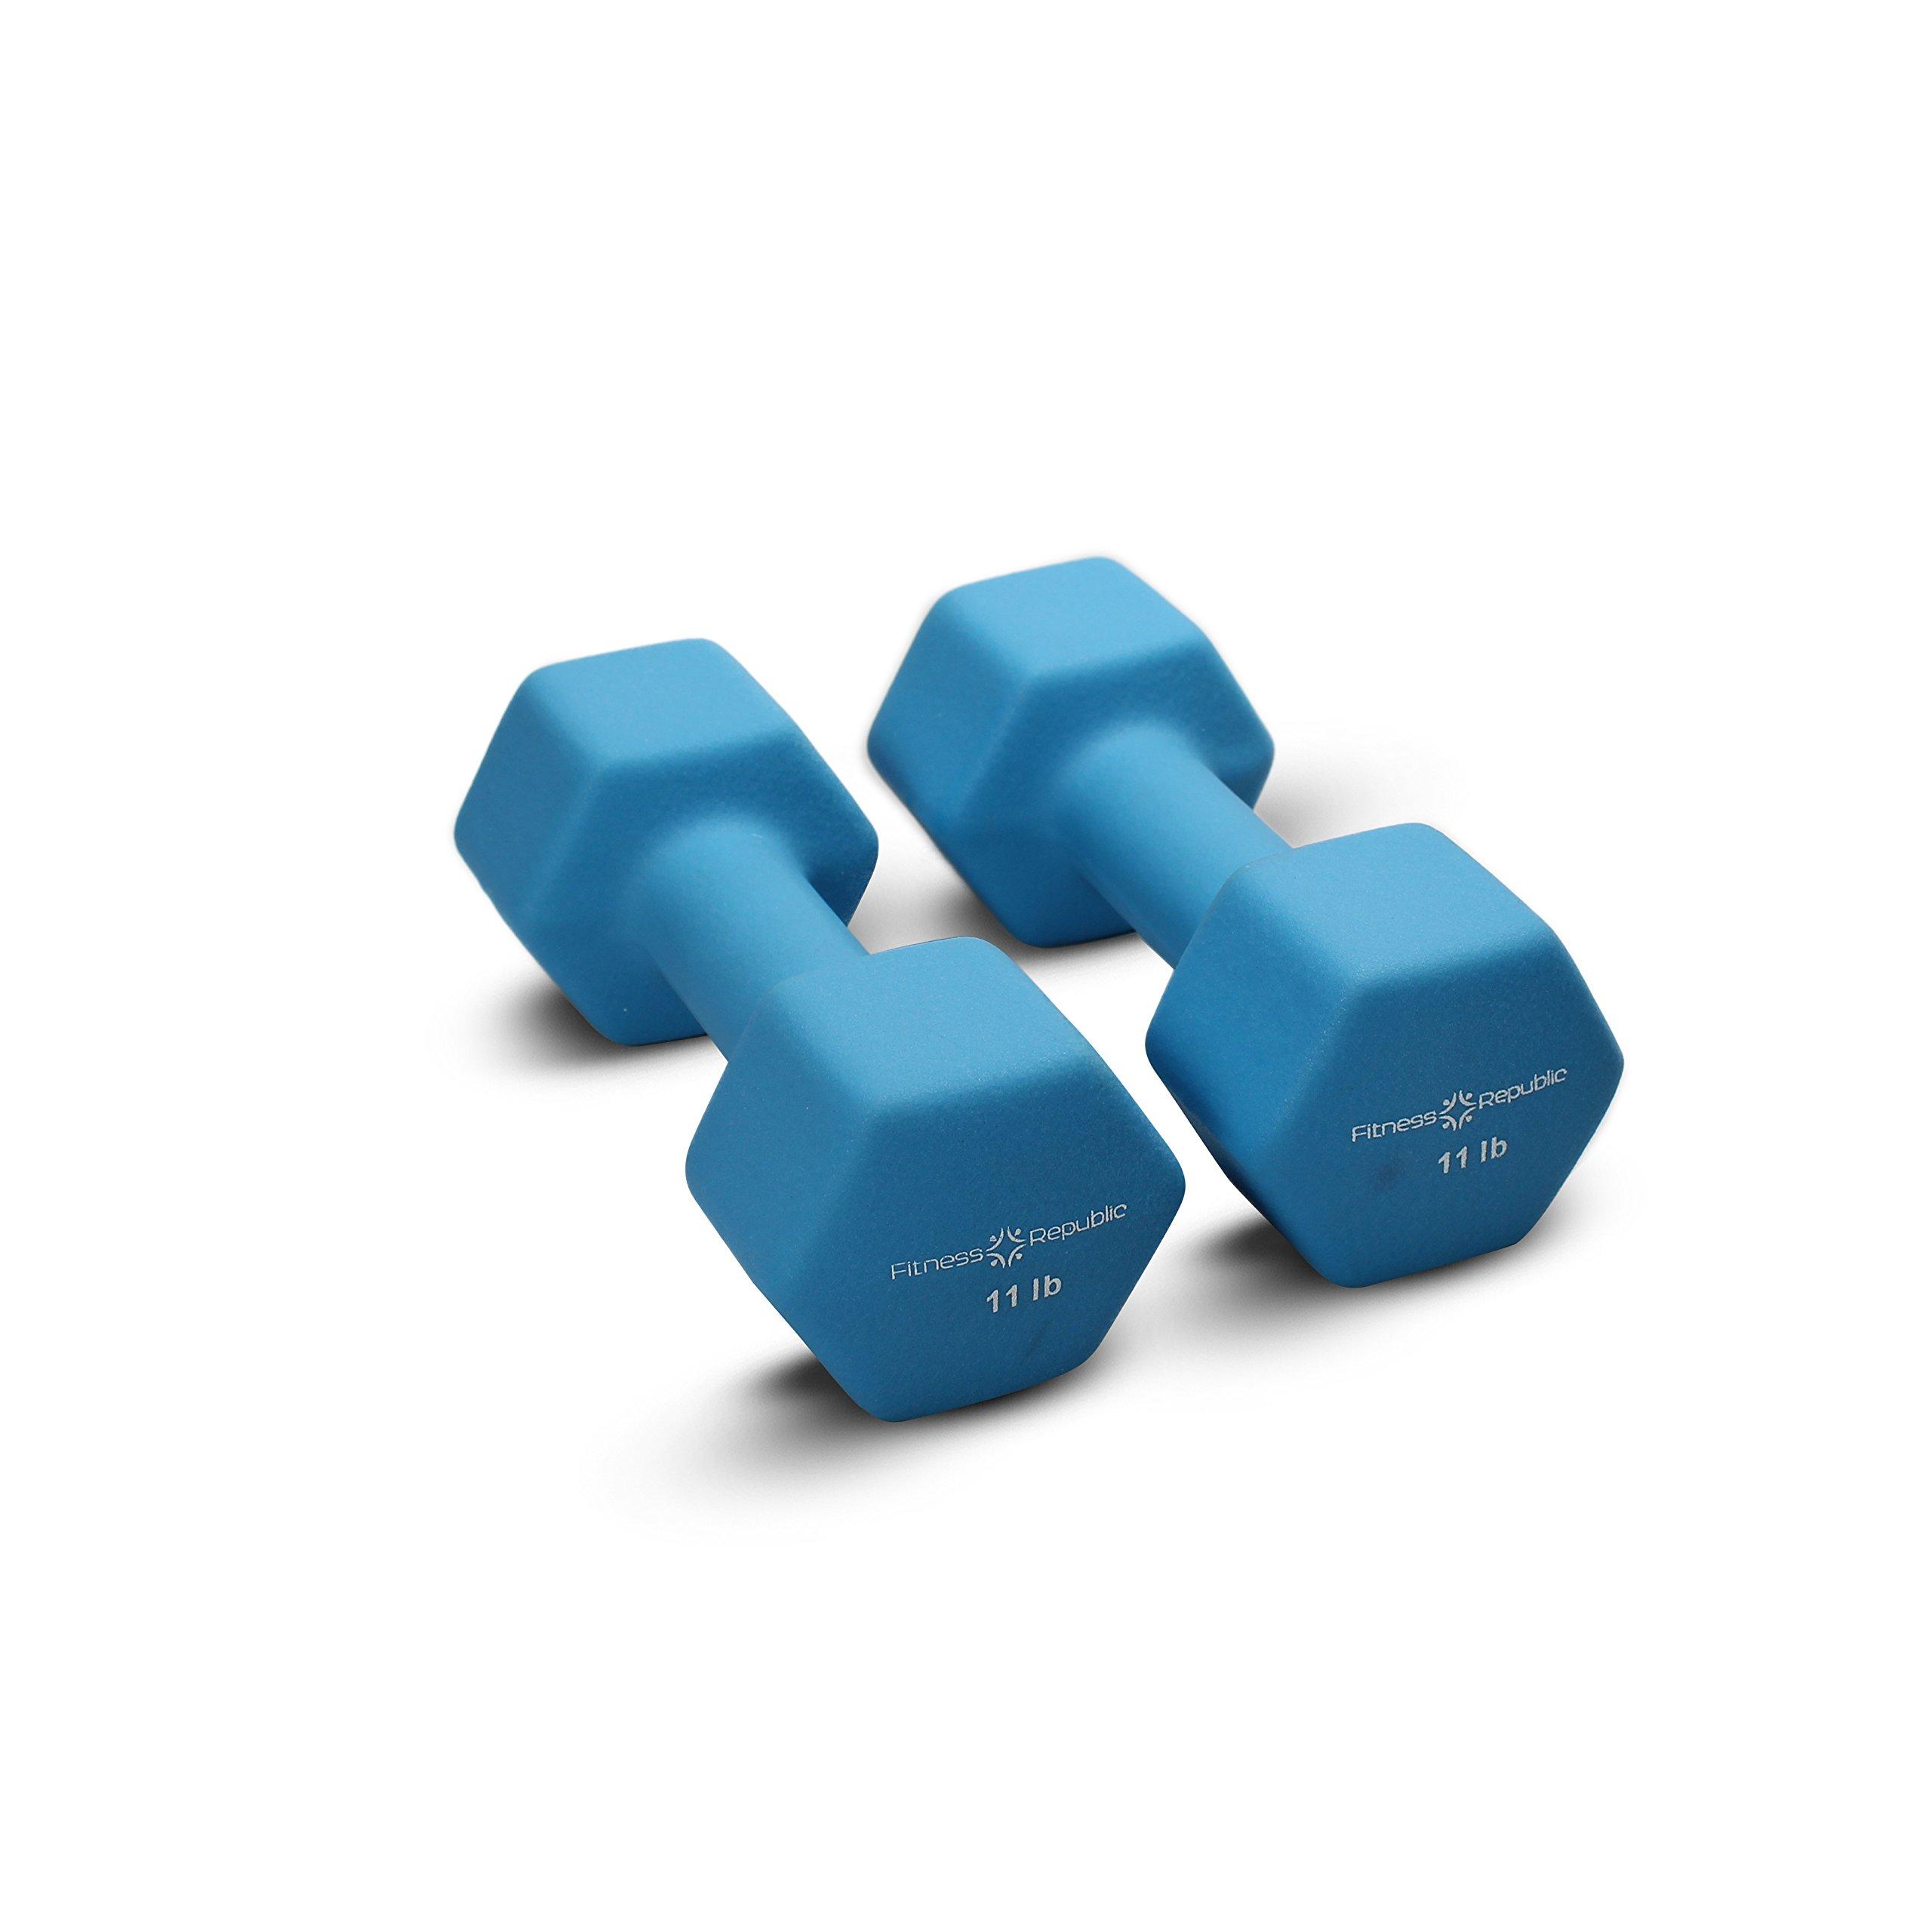 Fitness Republic Neoprene Dumbbells 11 lbs Set (Neoprene Weights)